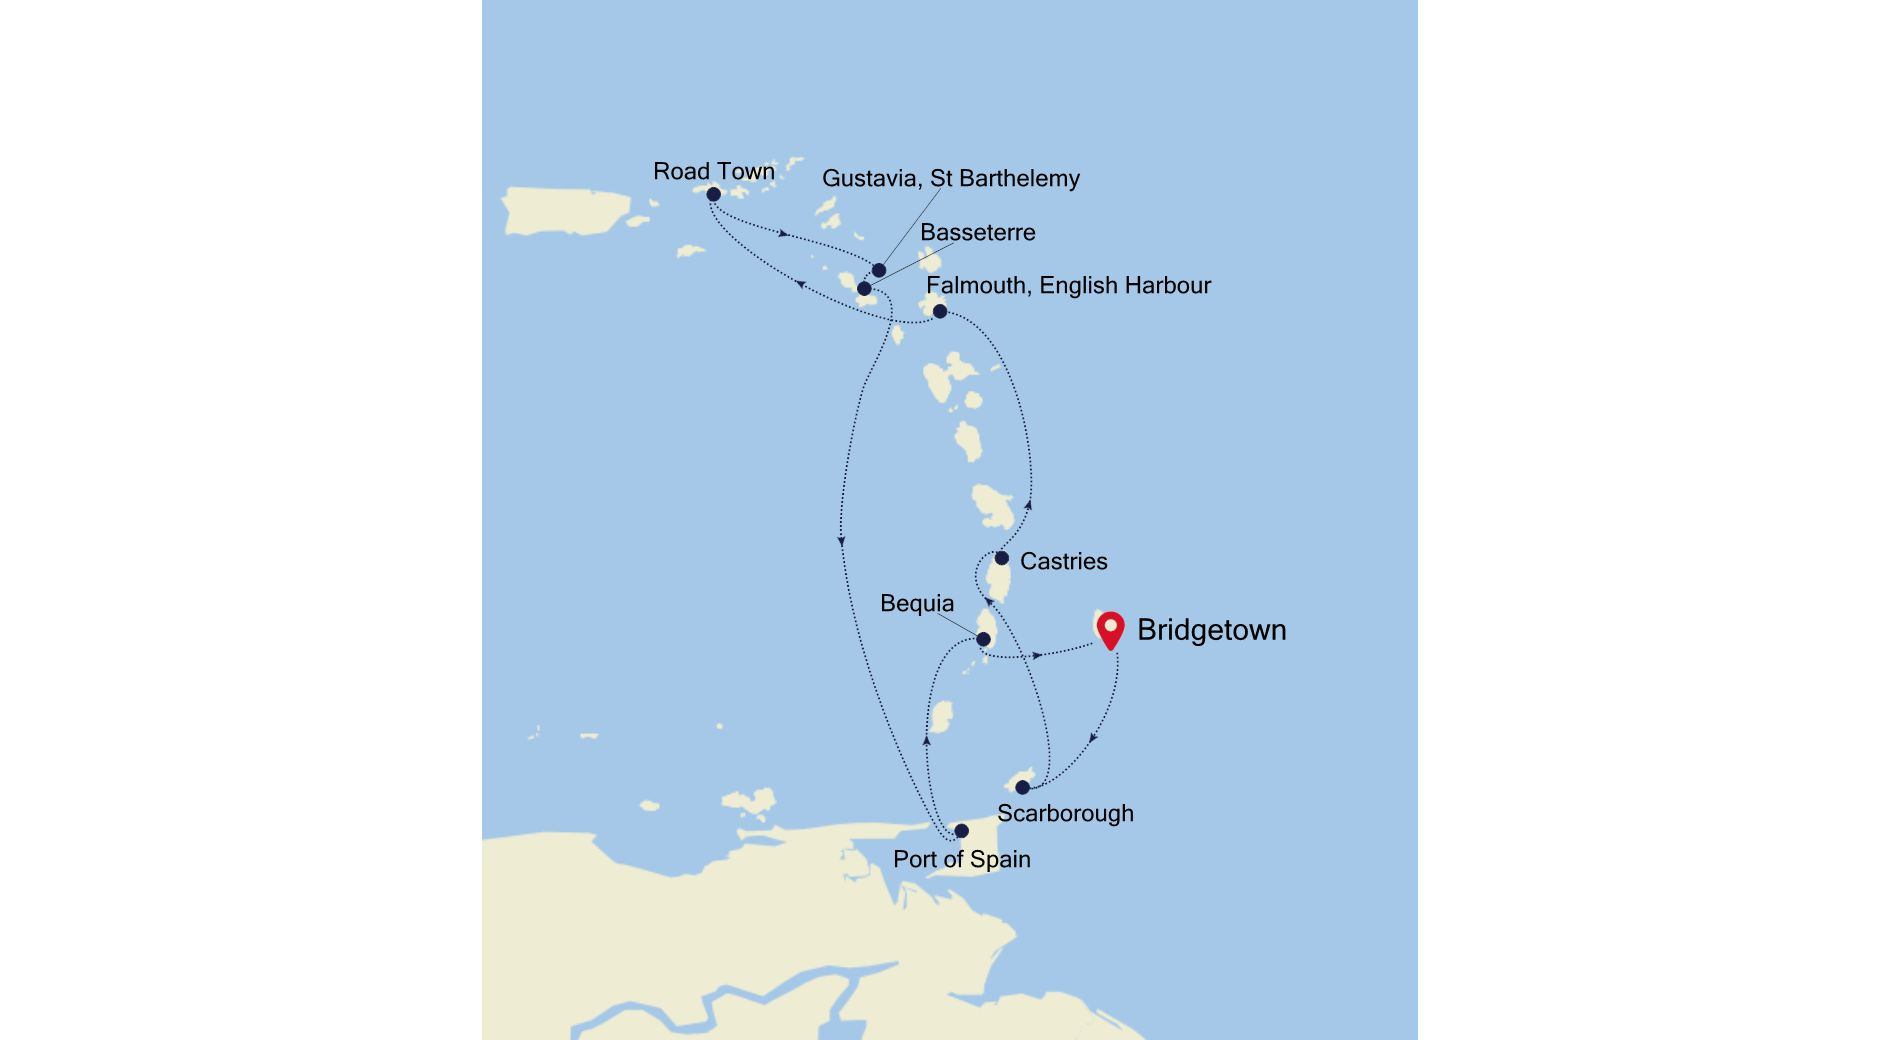 WH201218010 - Bridgetown to Bridgetown